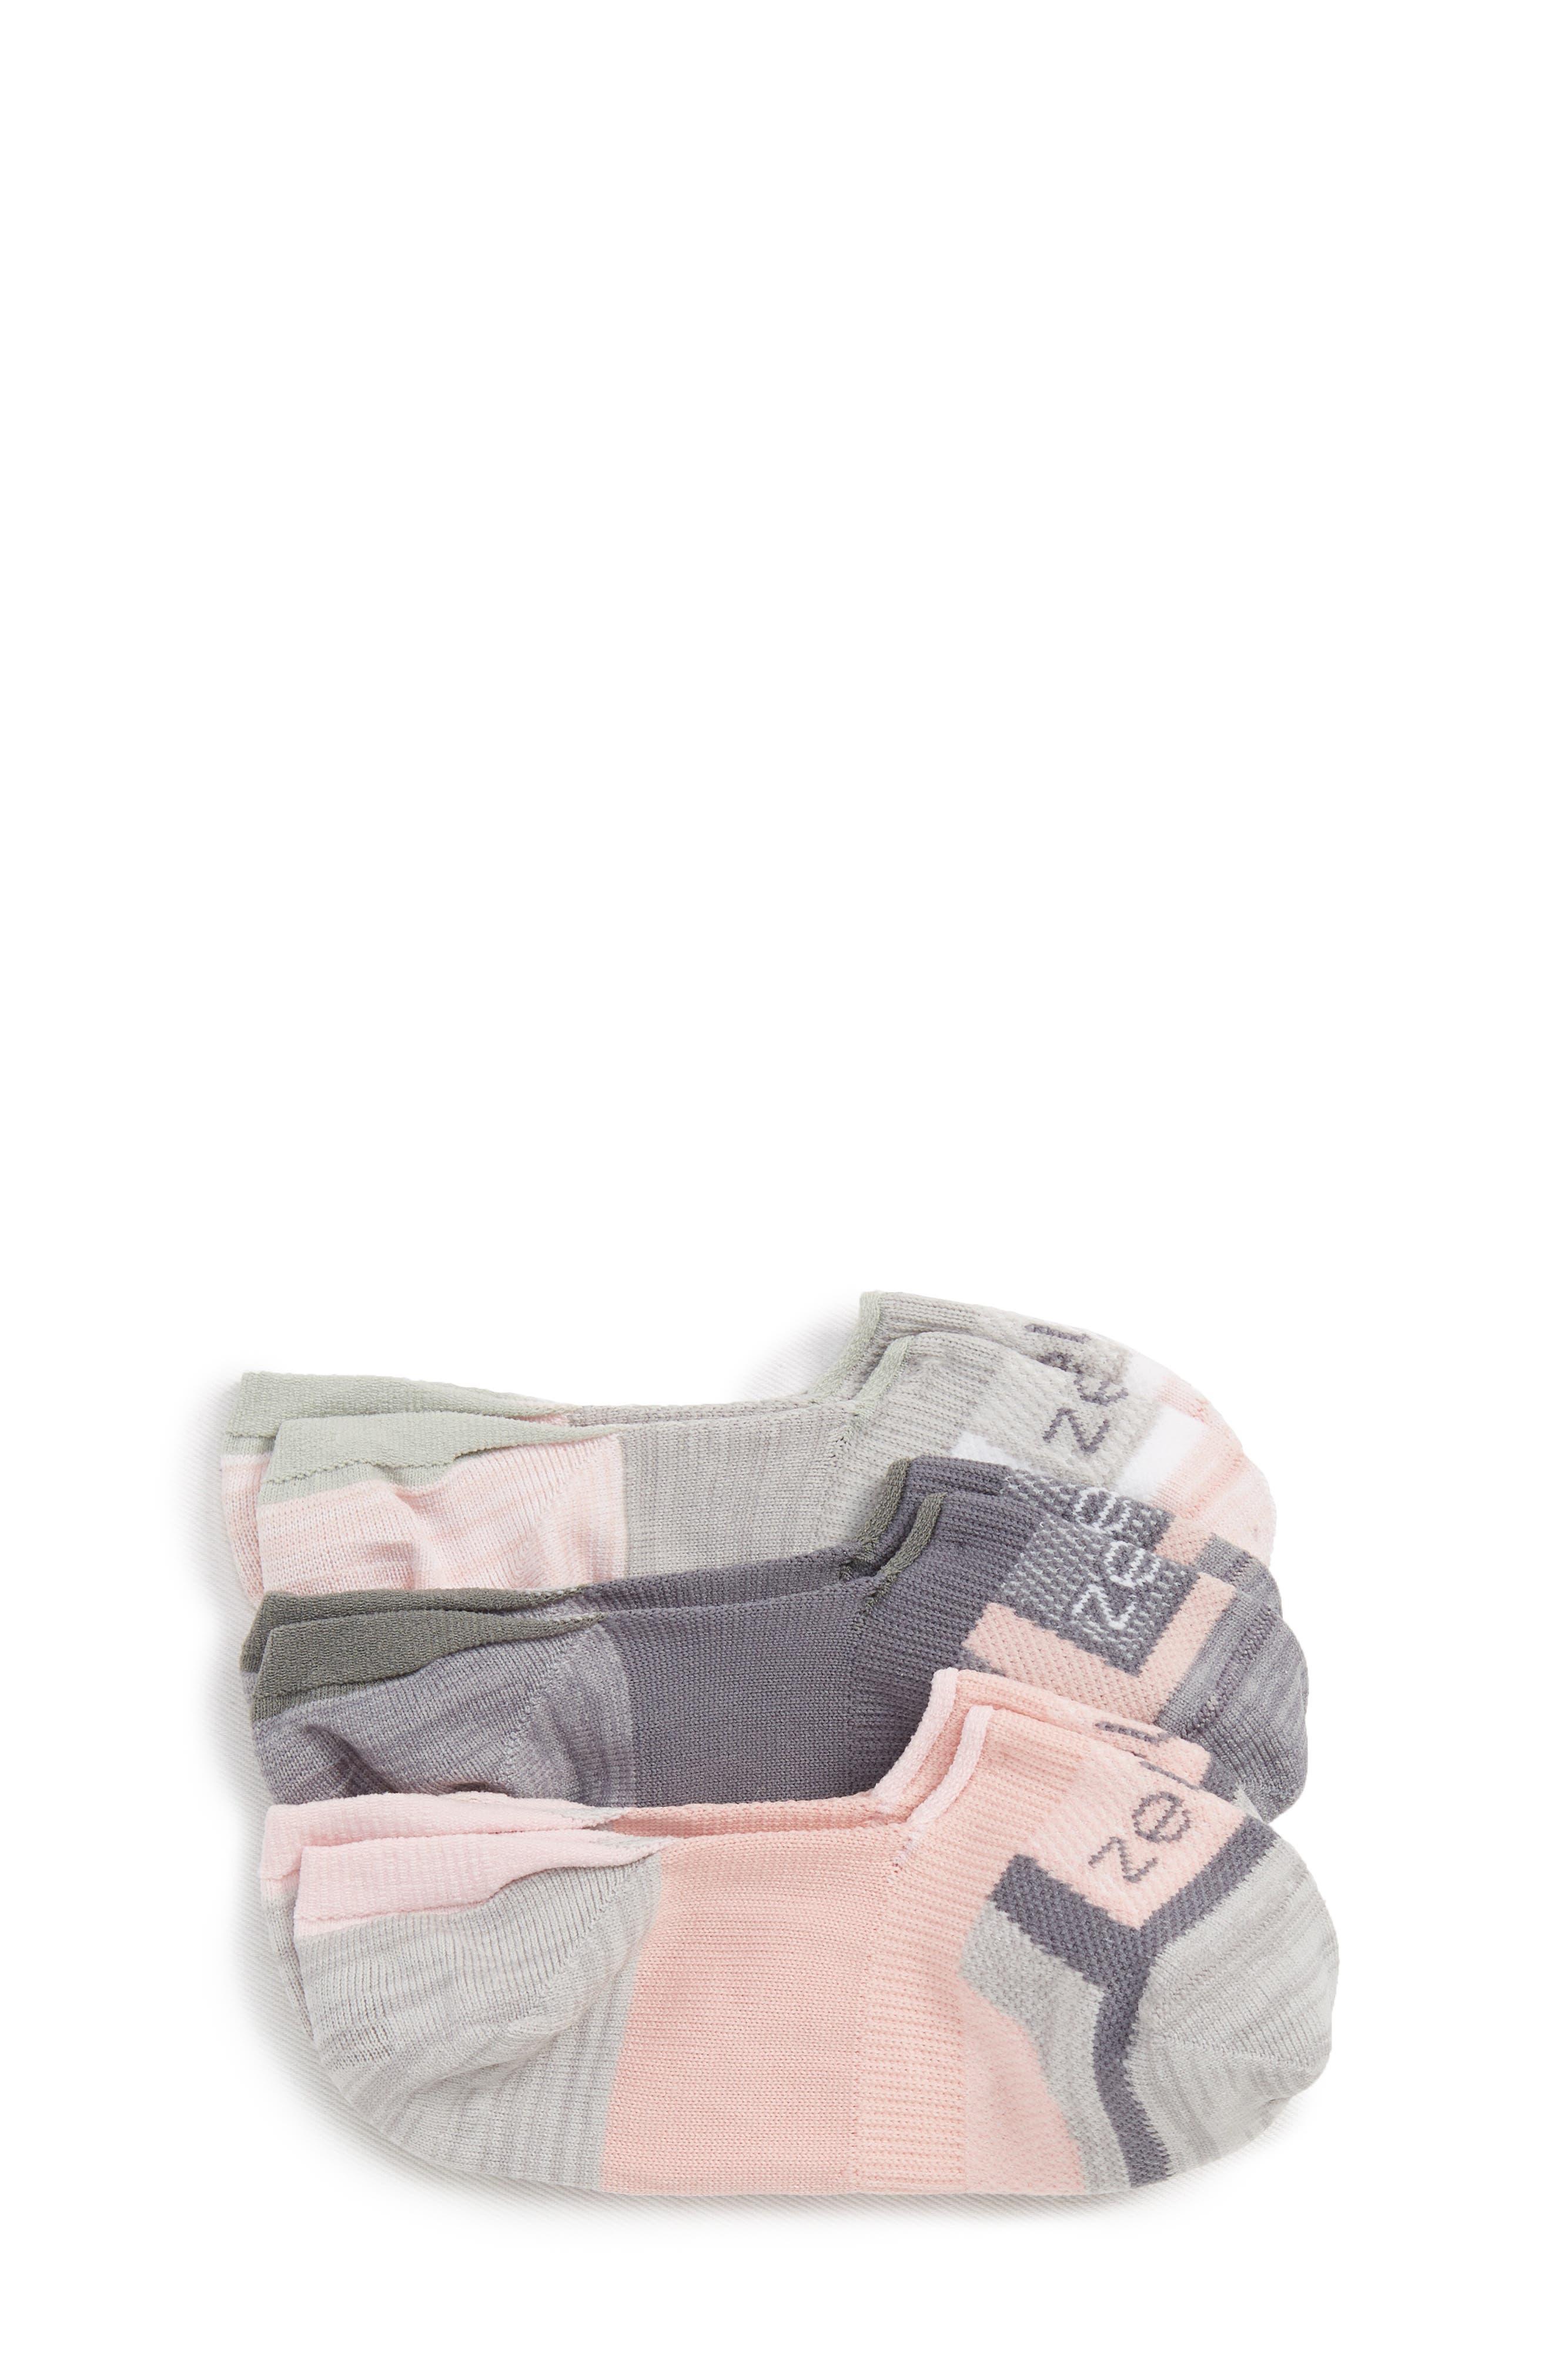 ZELLA GIRL Secret 3-Pack No-Show Socks, Main, color, 680